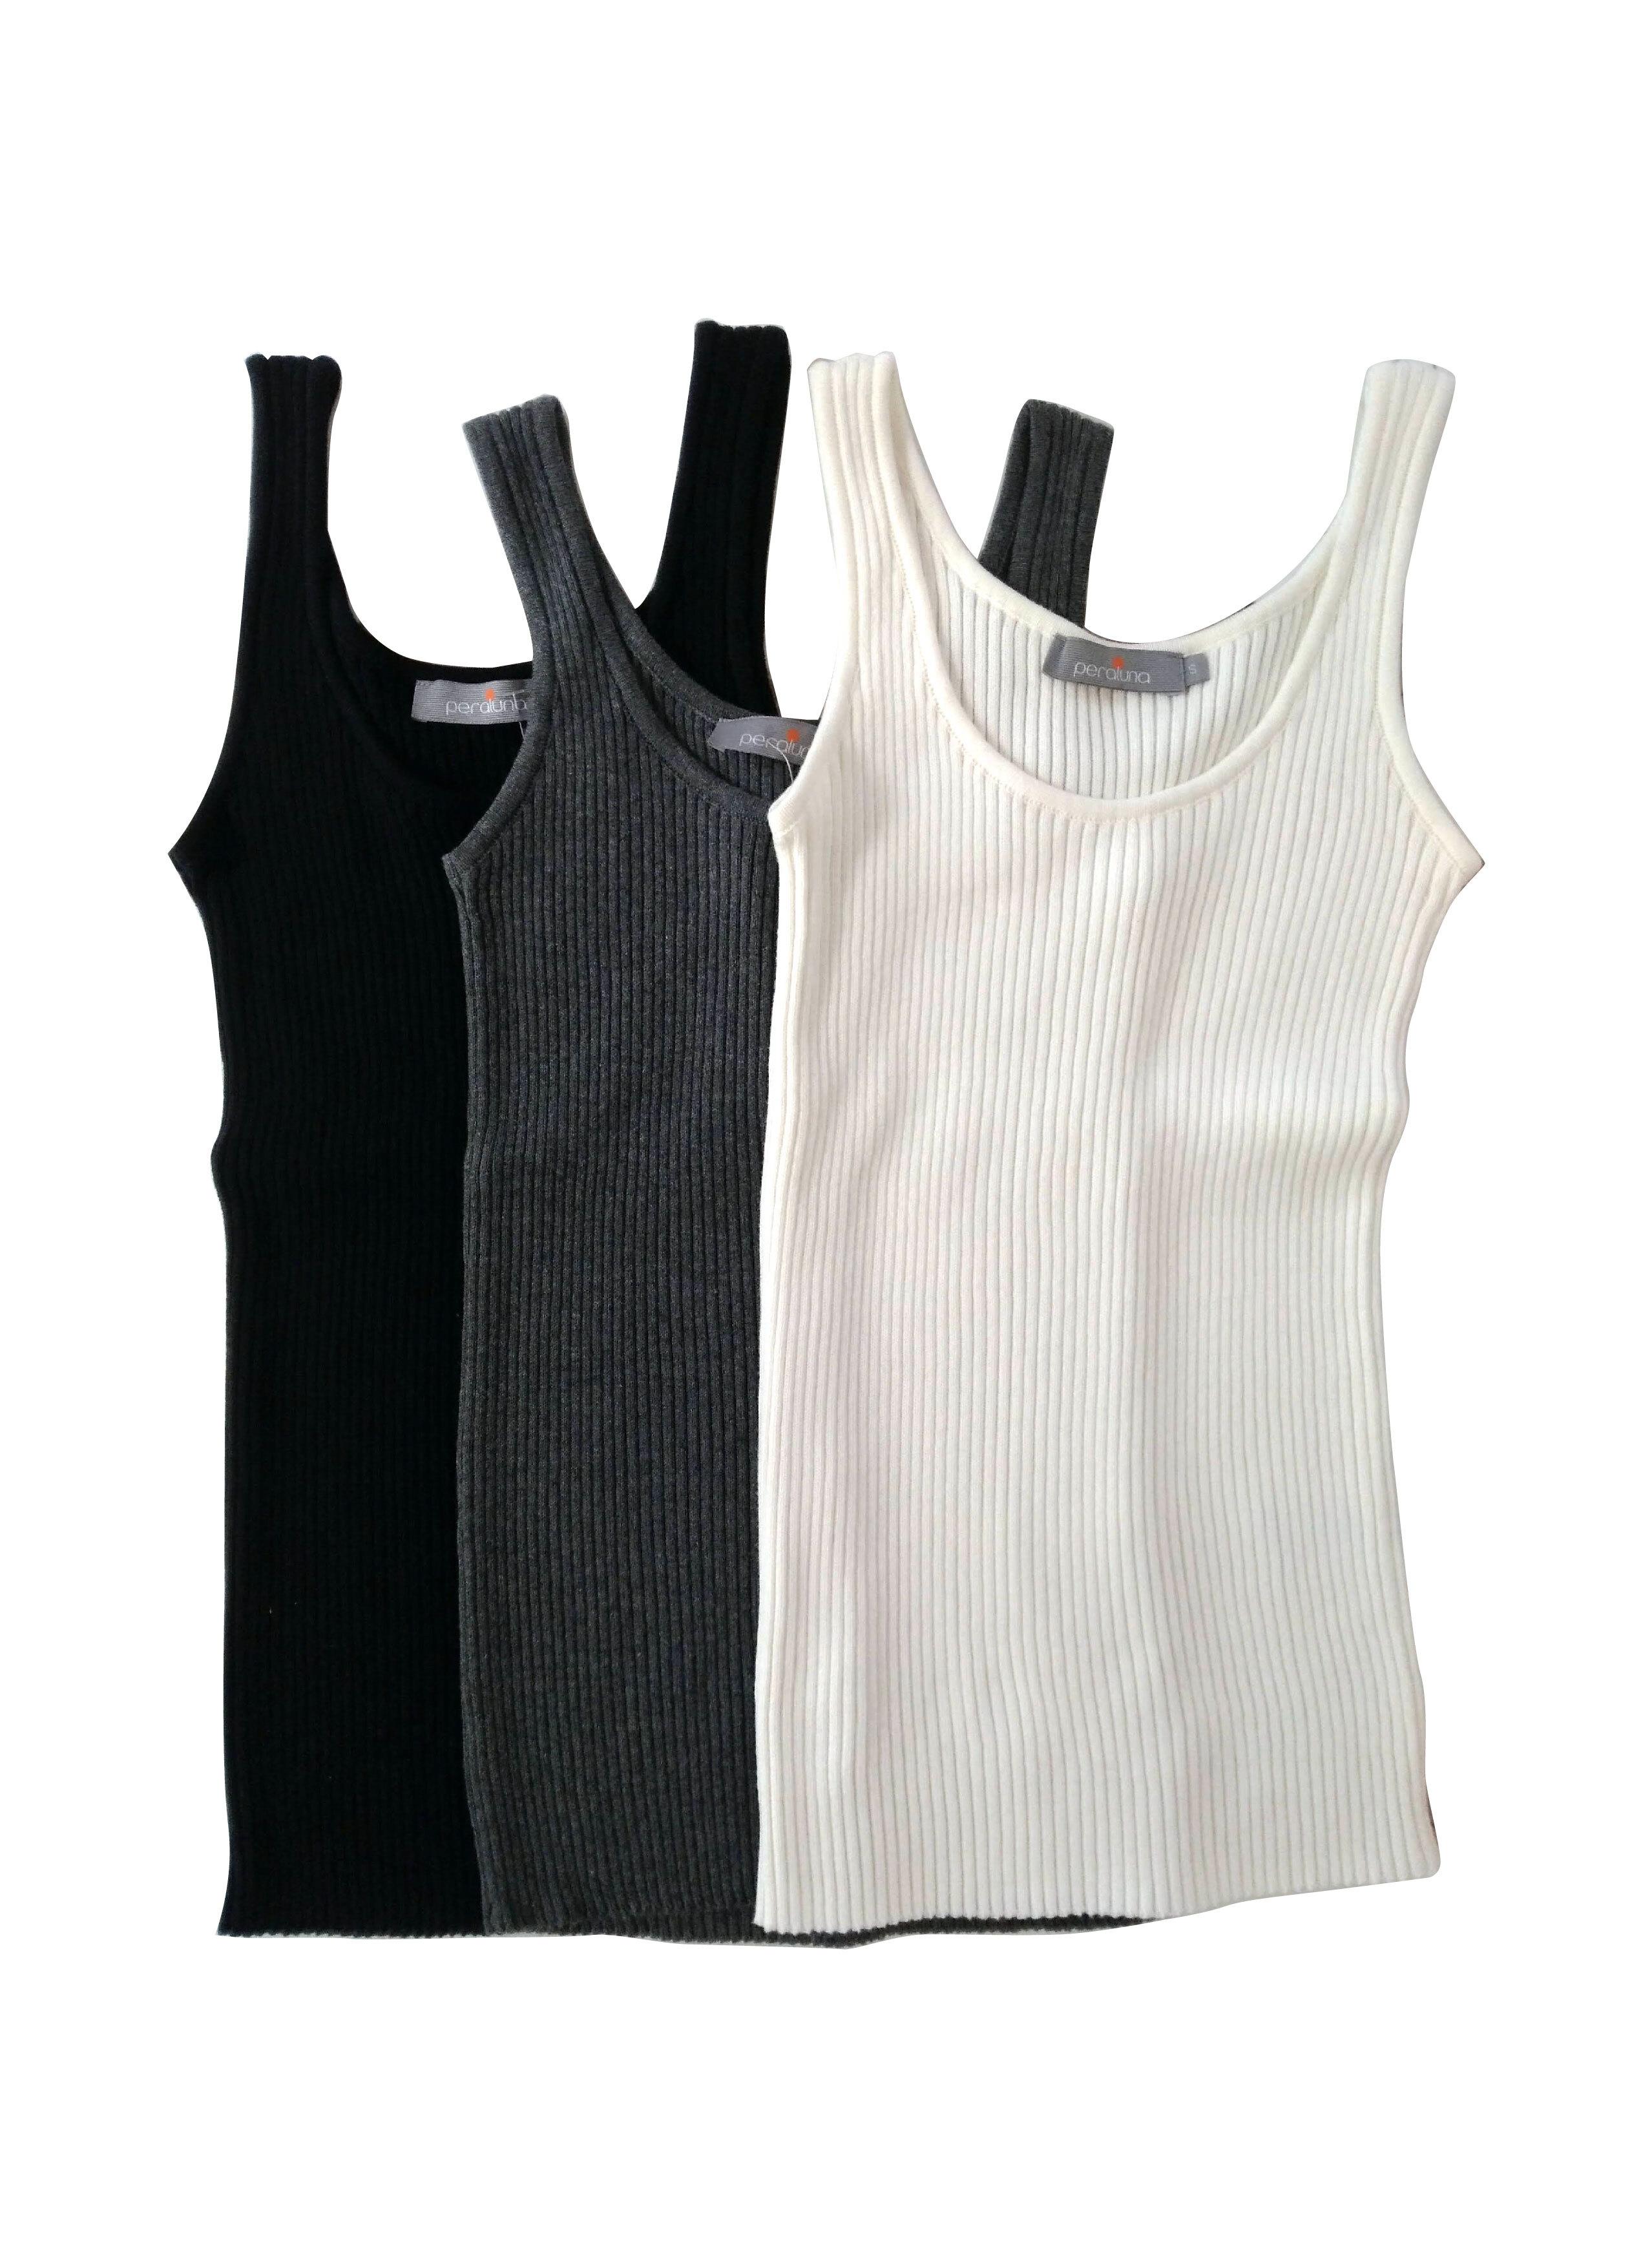 Cotton100 Basic knitting Rib Tanktops 3P ベーシックニットリブコットンタンクトップ3点セット